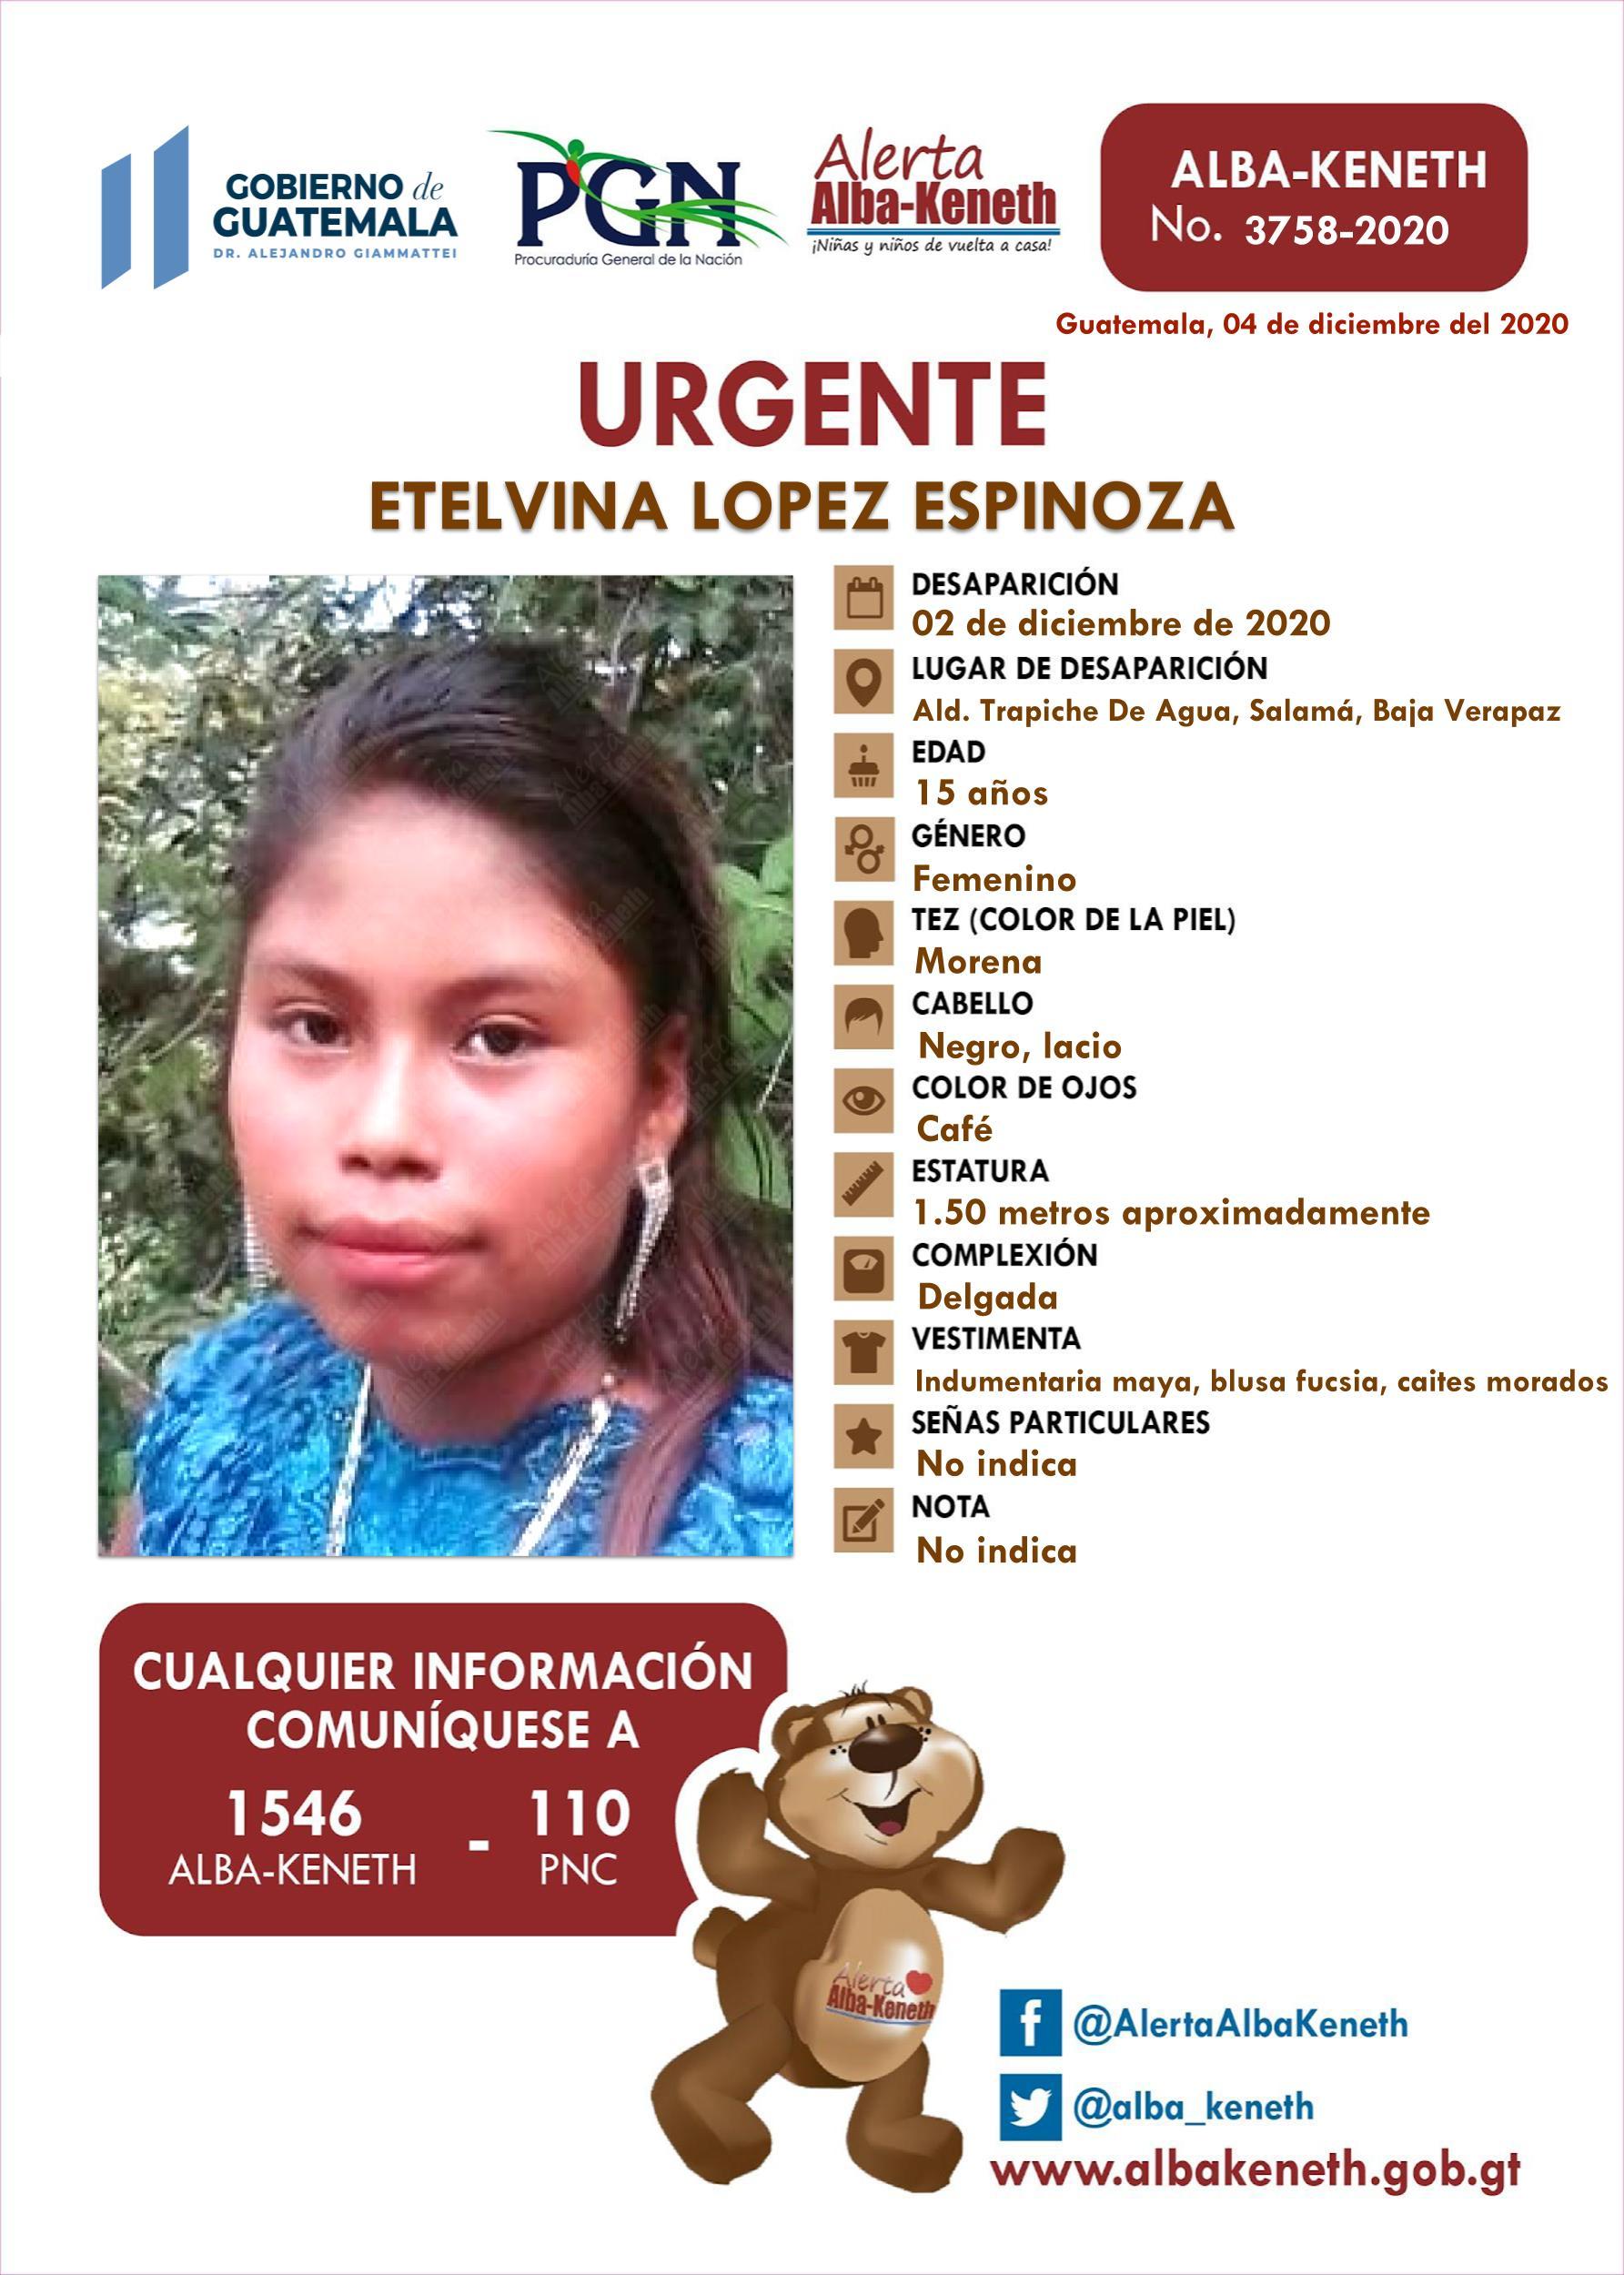 Etelvina Lopez Espinoza